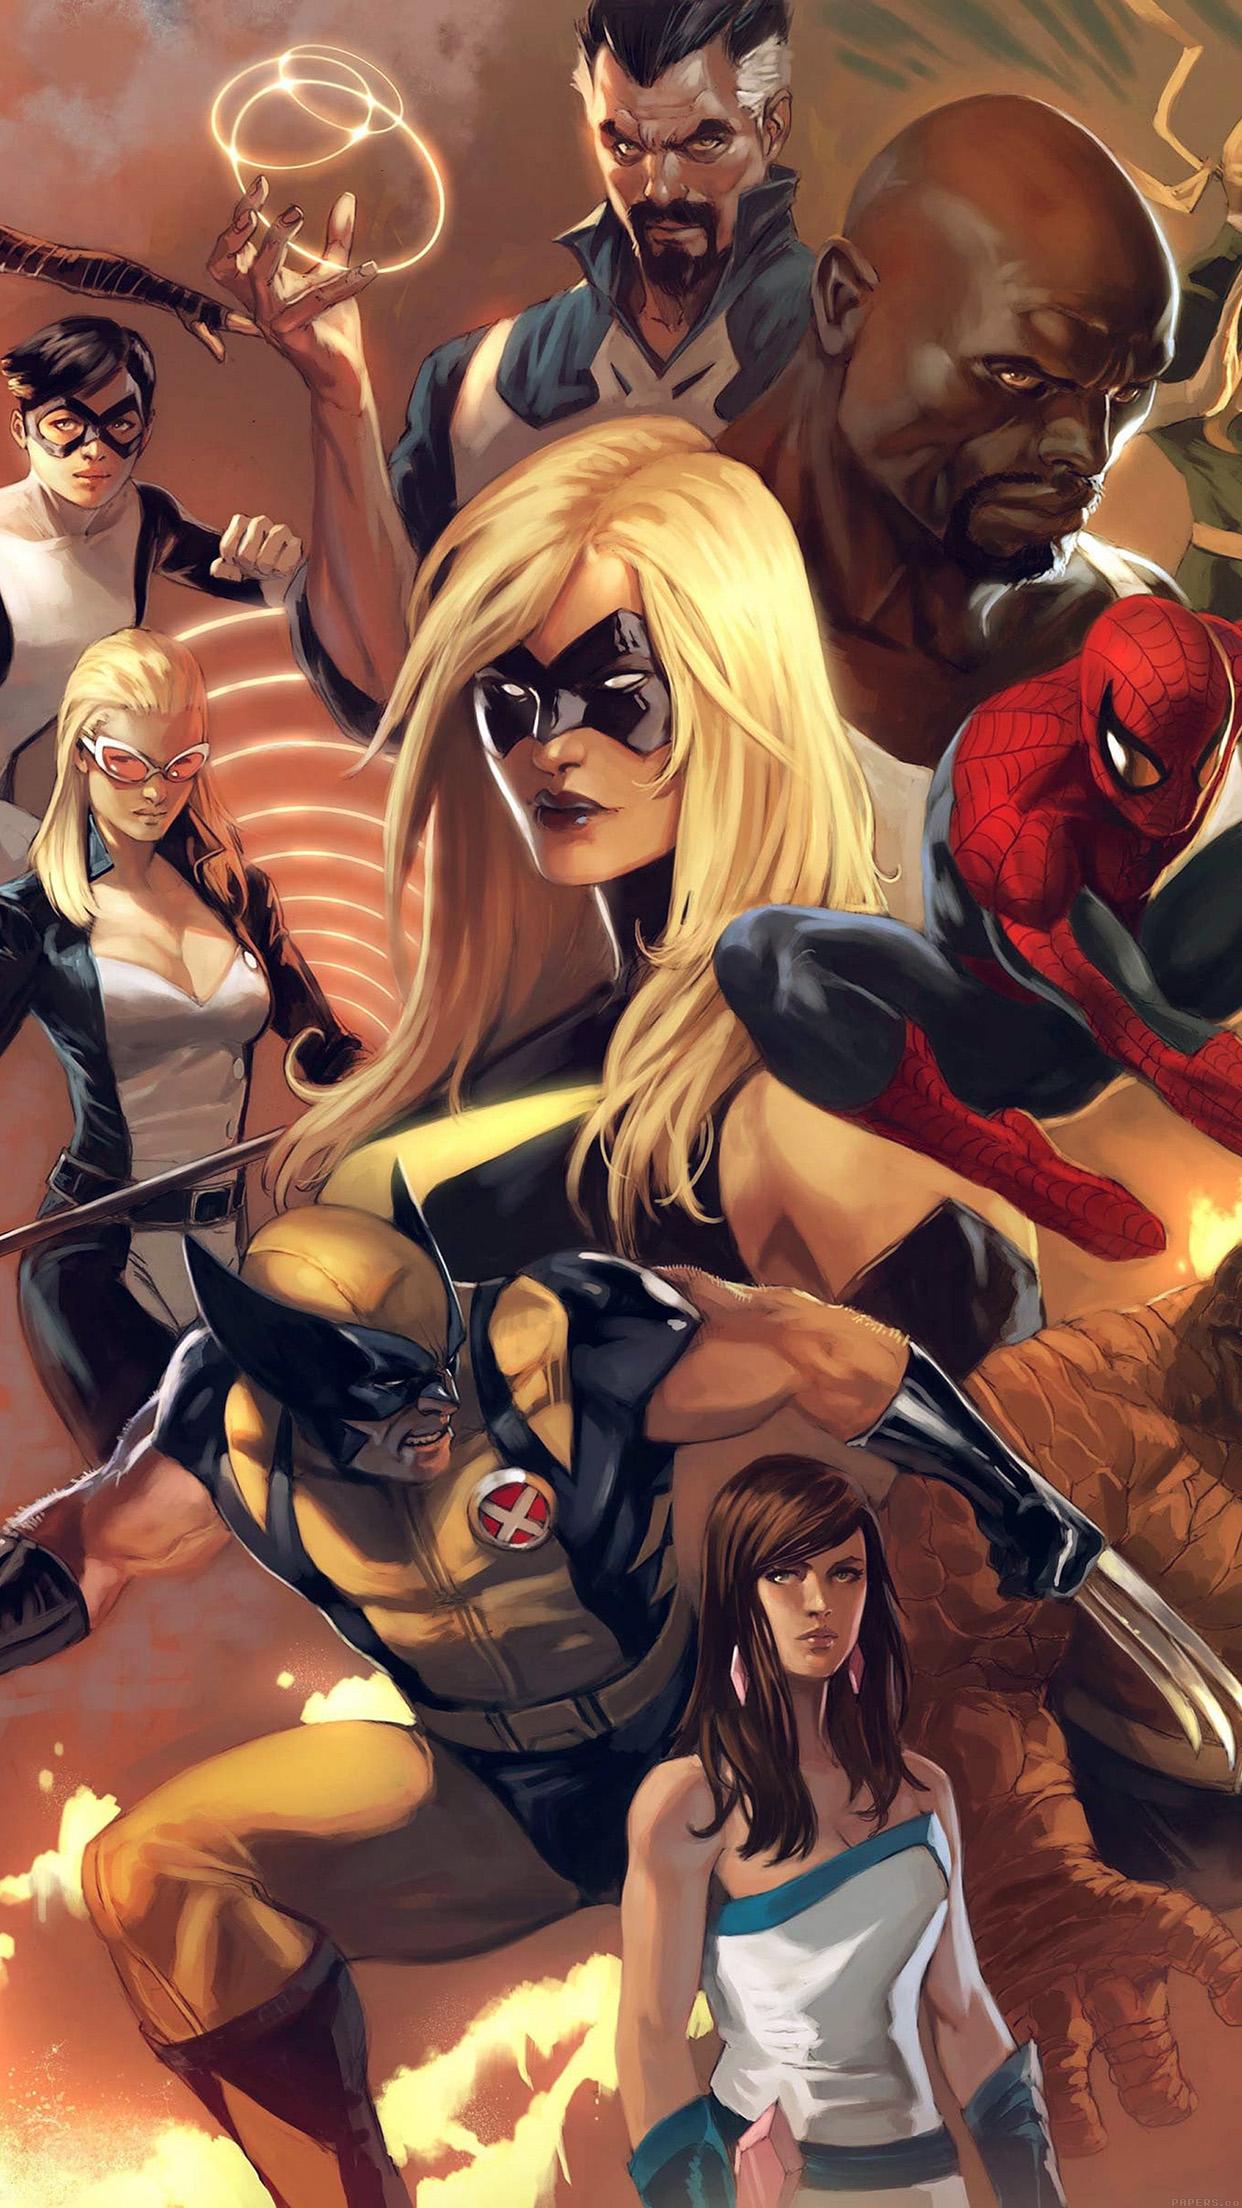 IPhone Wallpaper Al80 Avengers Liiust Comics